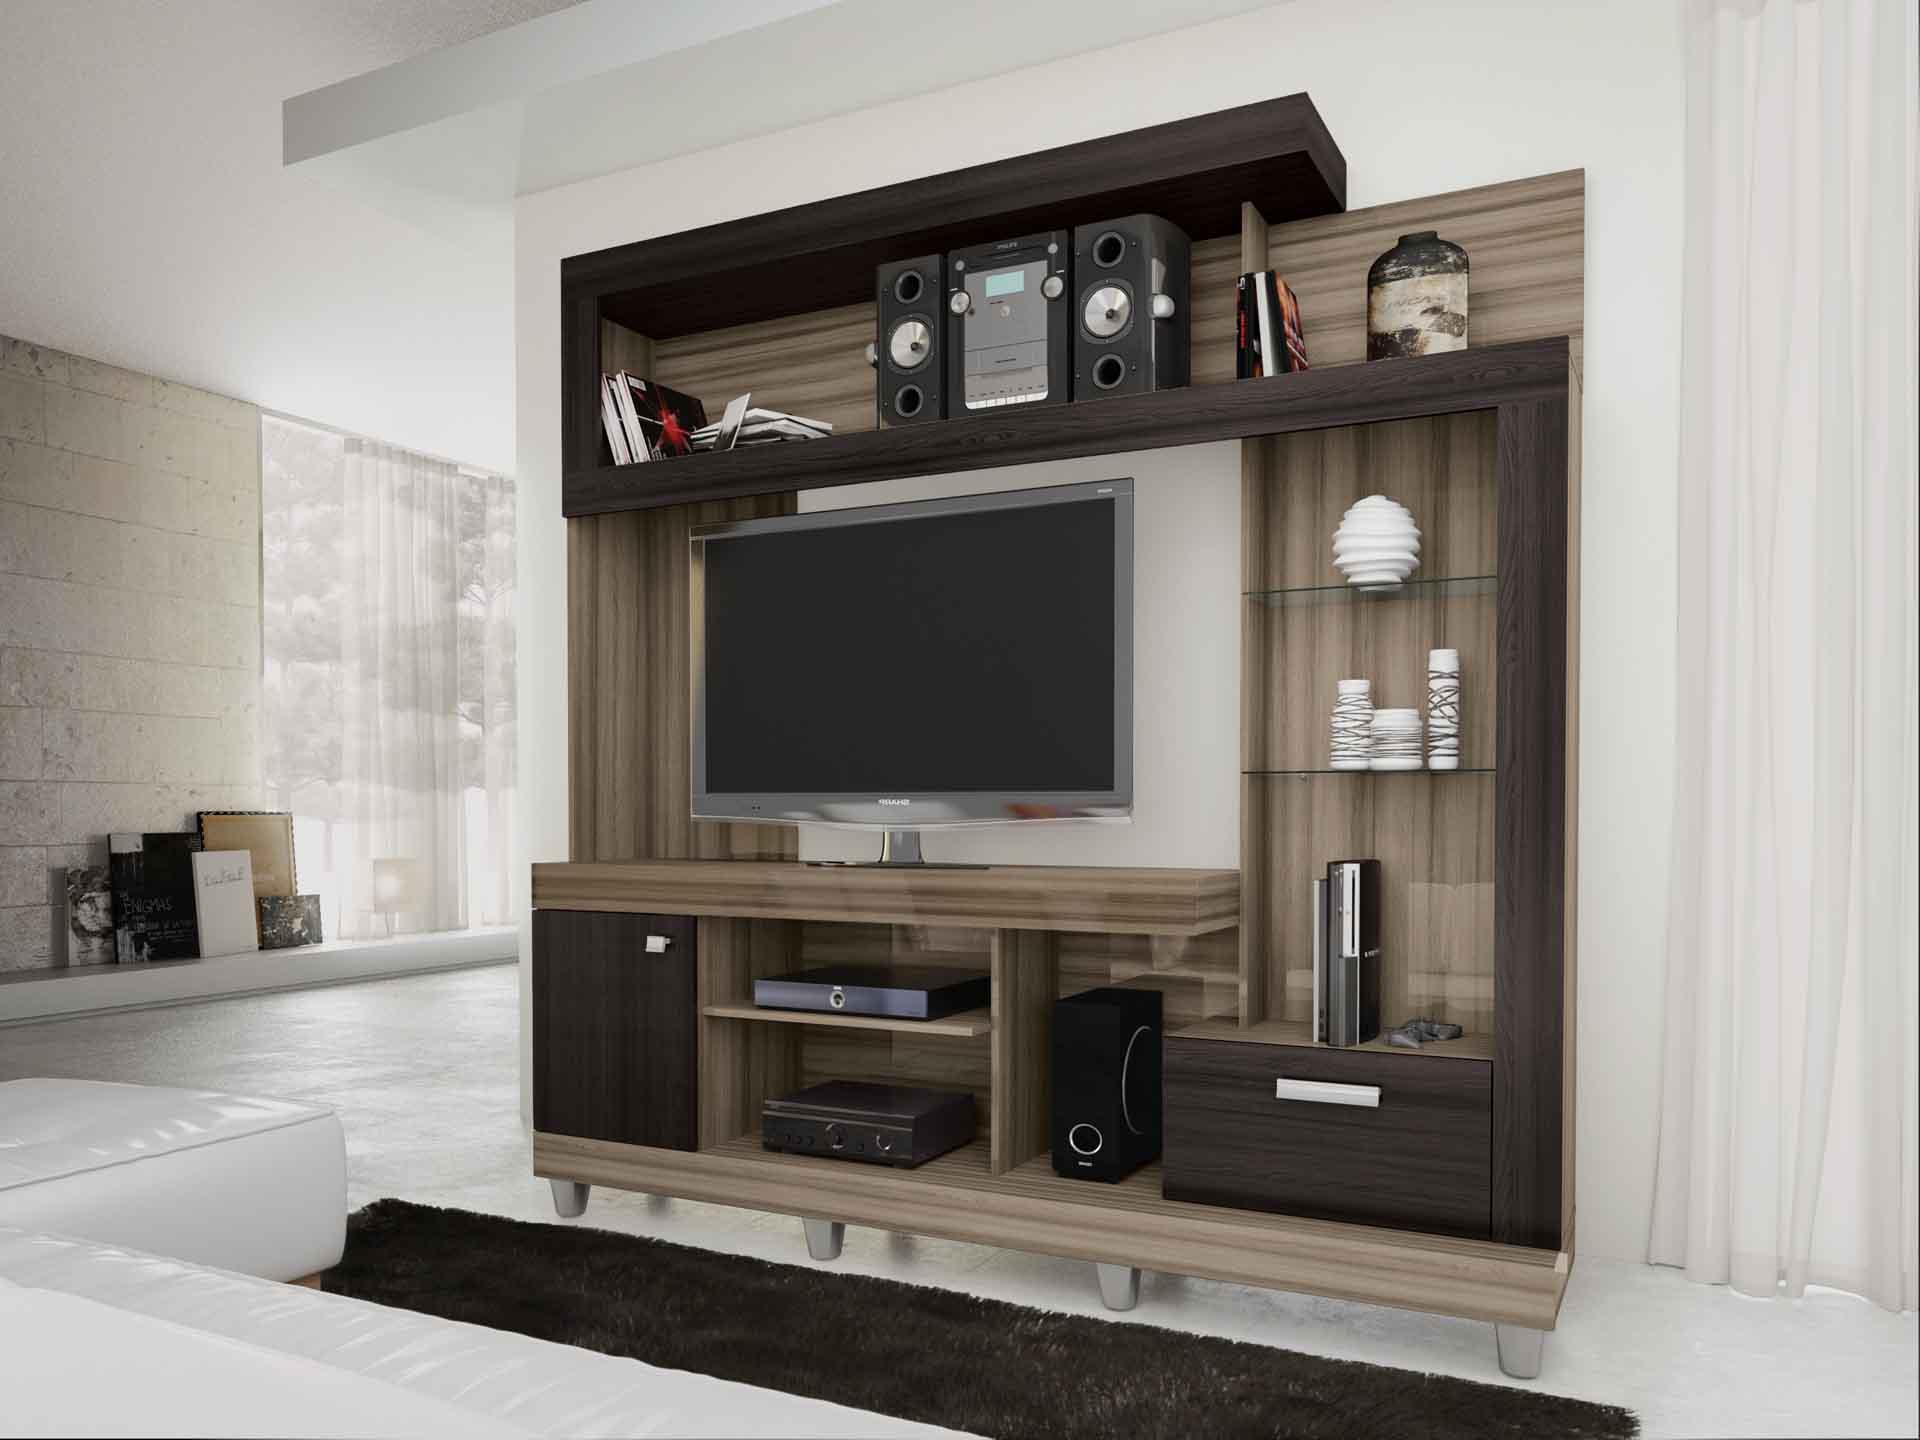 Muebles Caemmun - Brazilian Furniture Caemmun Industria E Comercio De Moveis Ltda [mjhdah]http://mobiliarioycia.com/wp-content/uploads/2016/08/HOME-THEATER-PRESENCE-DESIRA-DUNAX-TEX-1.jpg